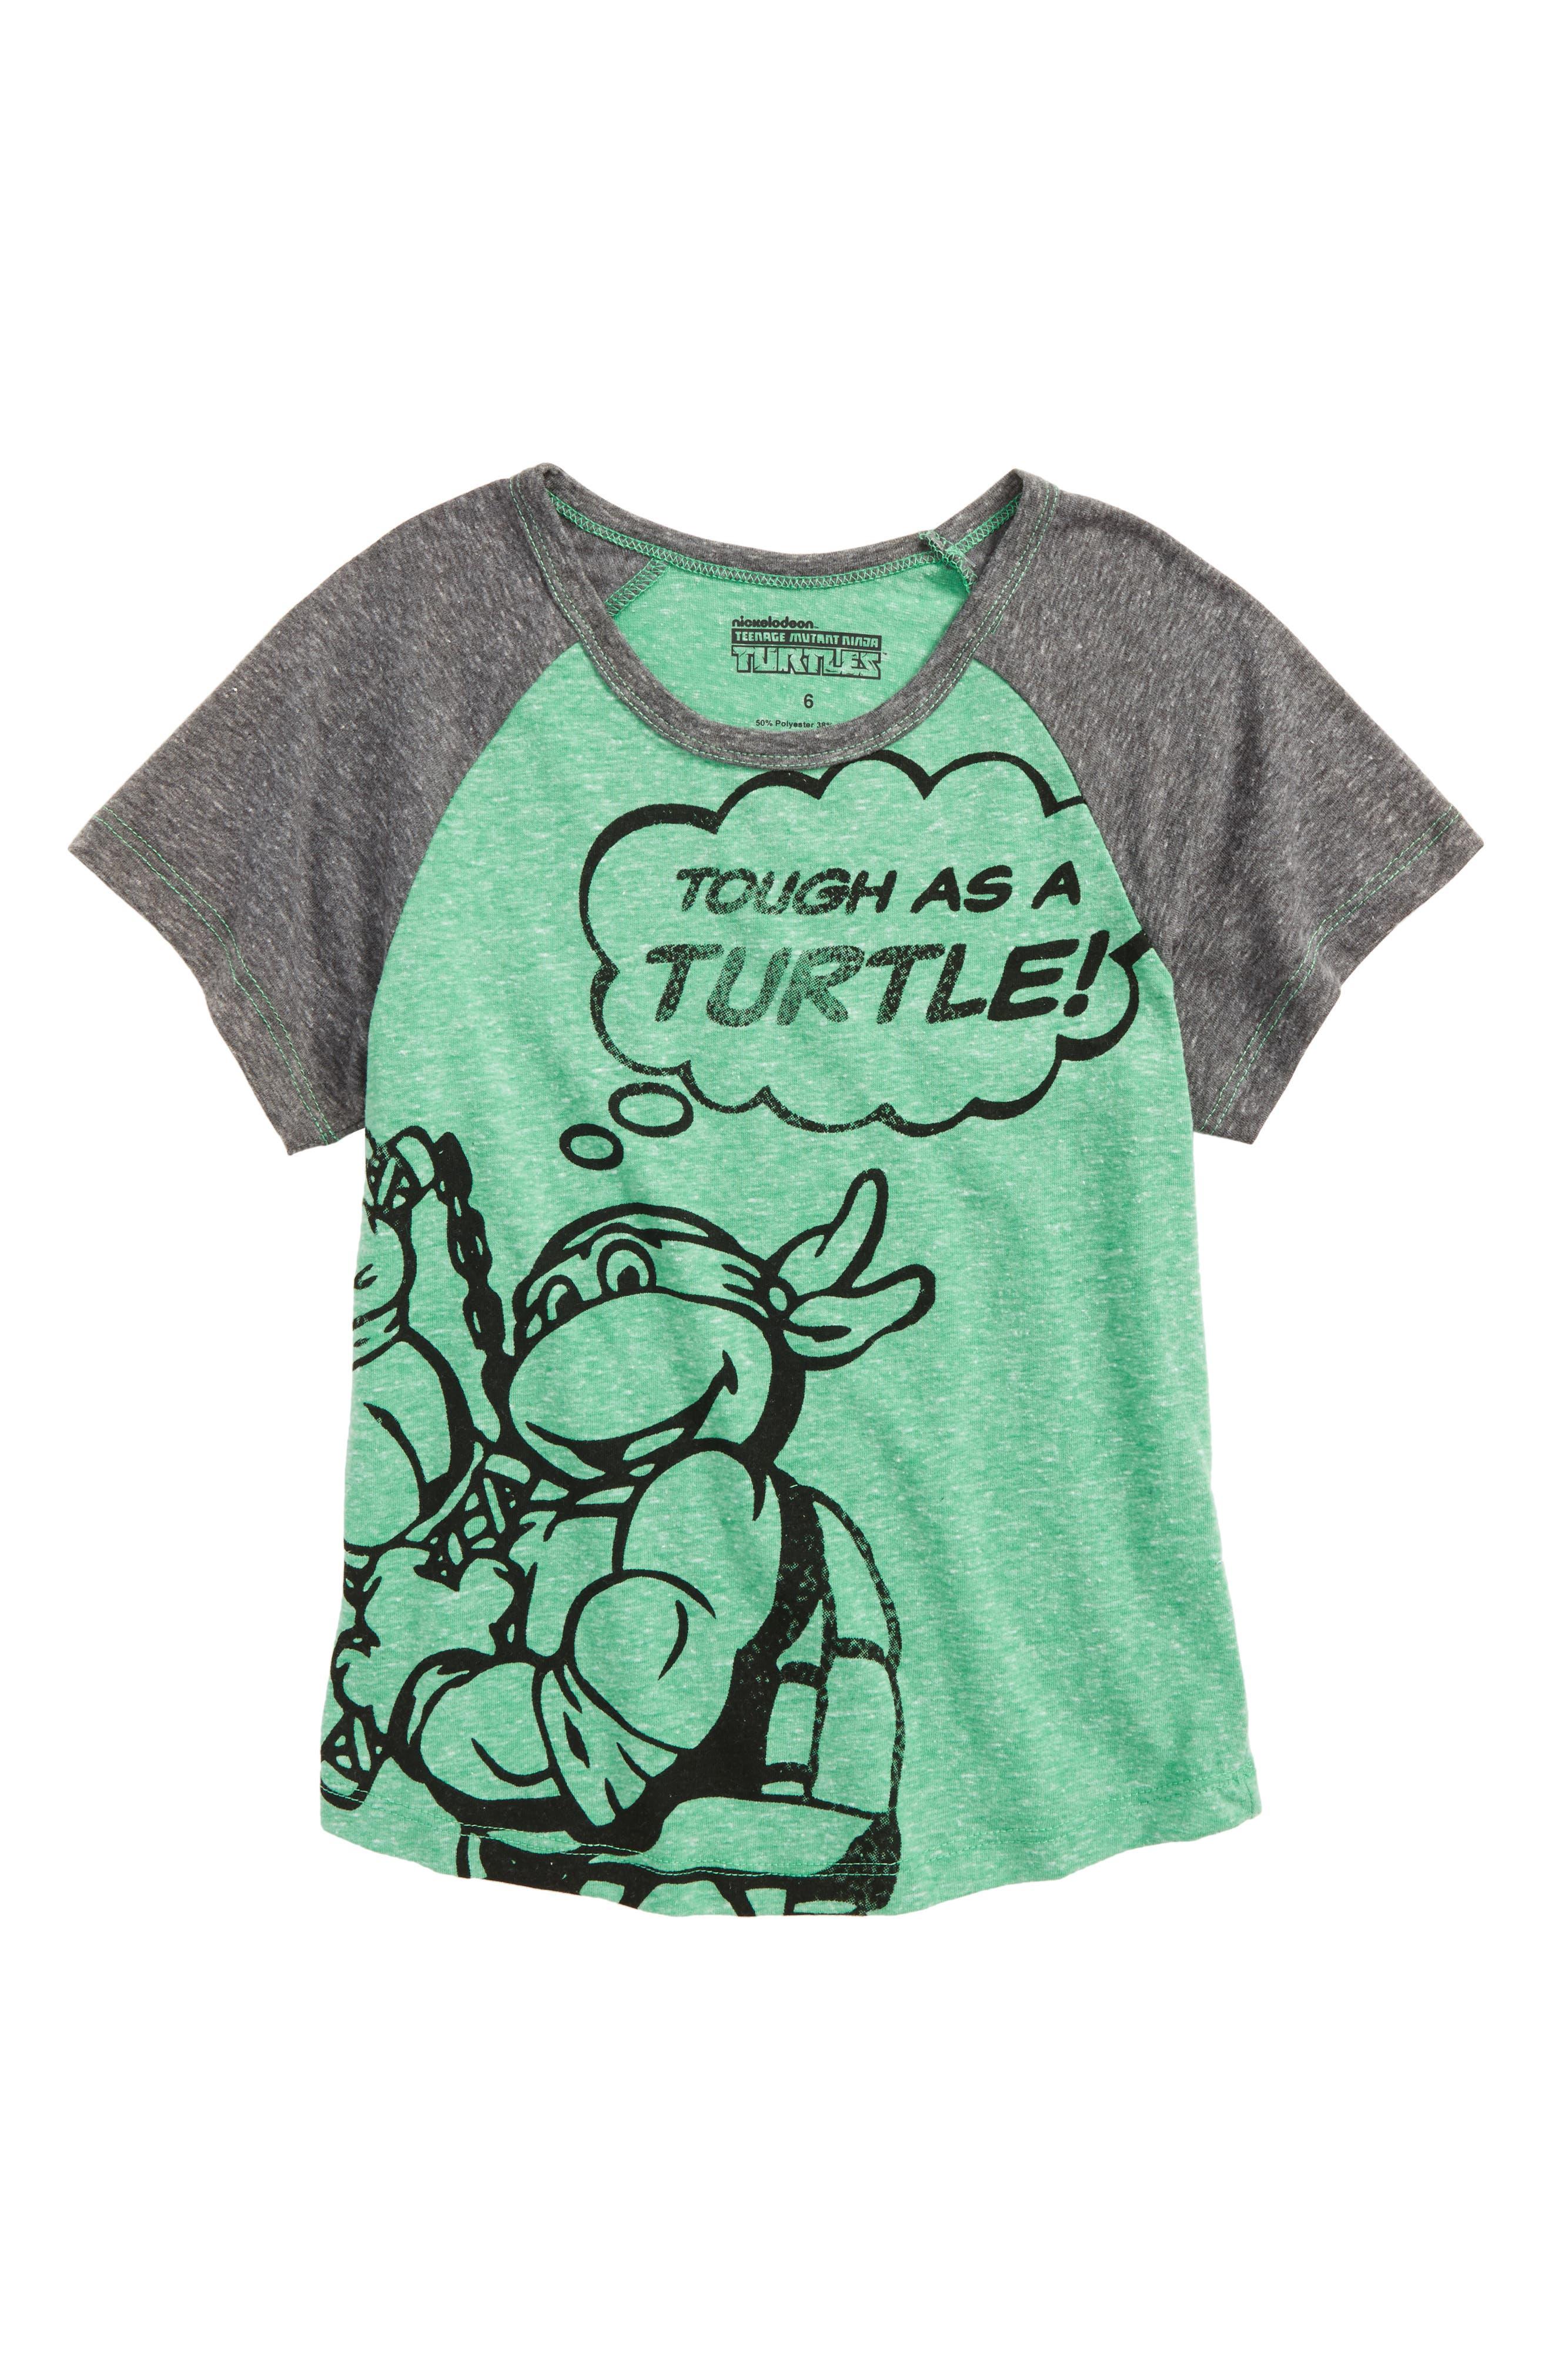 TMNT - Tough as a Turtle Graphic T-Shirt,                         Main,                         color, 300